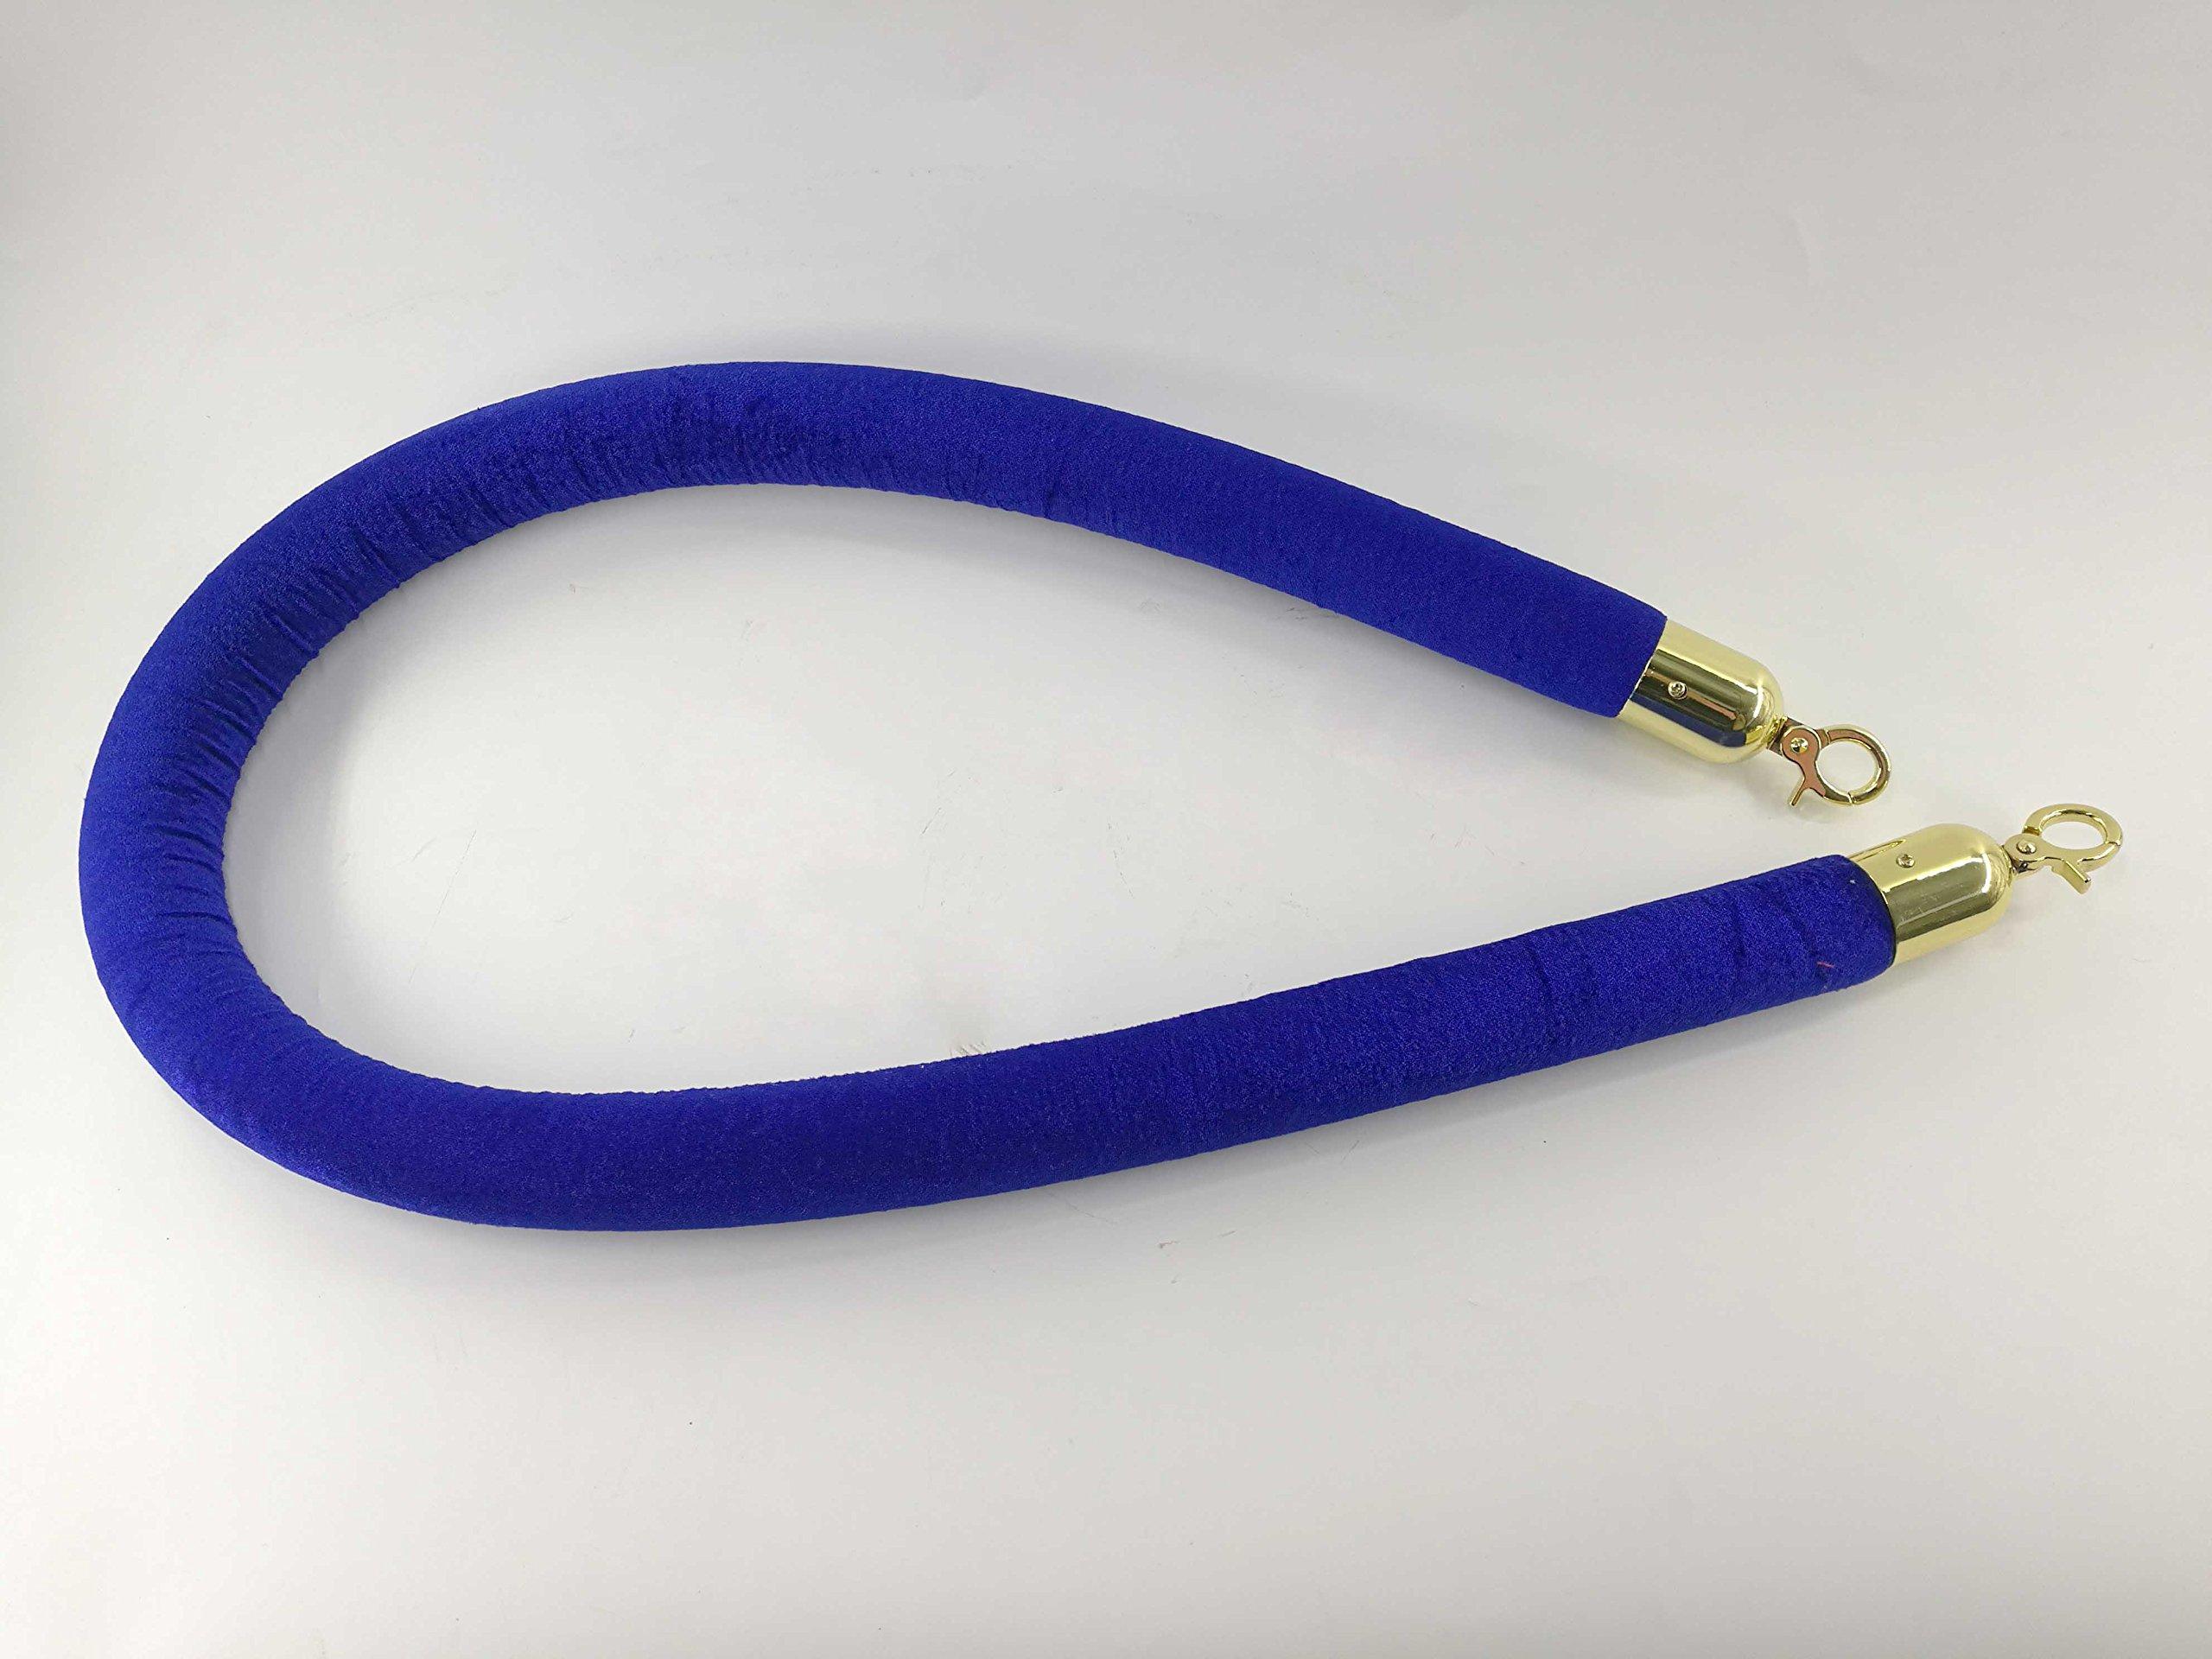 FixtureDisplays Crowd Control Stanchion Queue Barrier Post 59'' Blue Velvet Rope 12004-9-BLUE-GOLD by FixtureDisplays